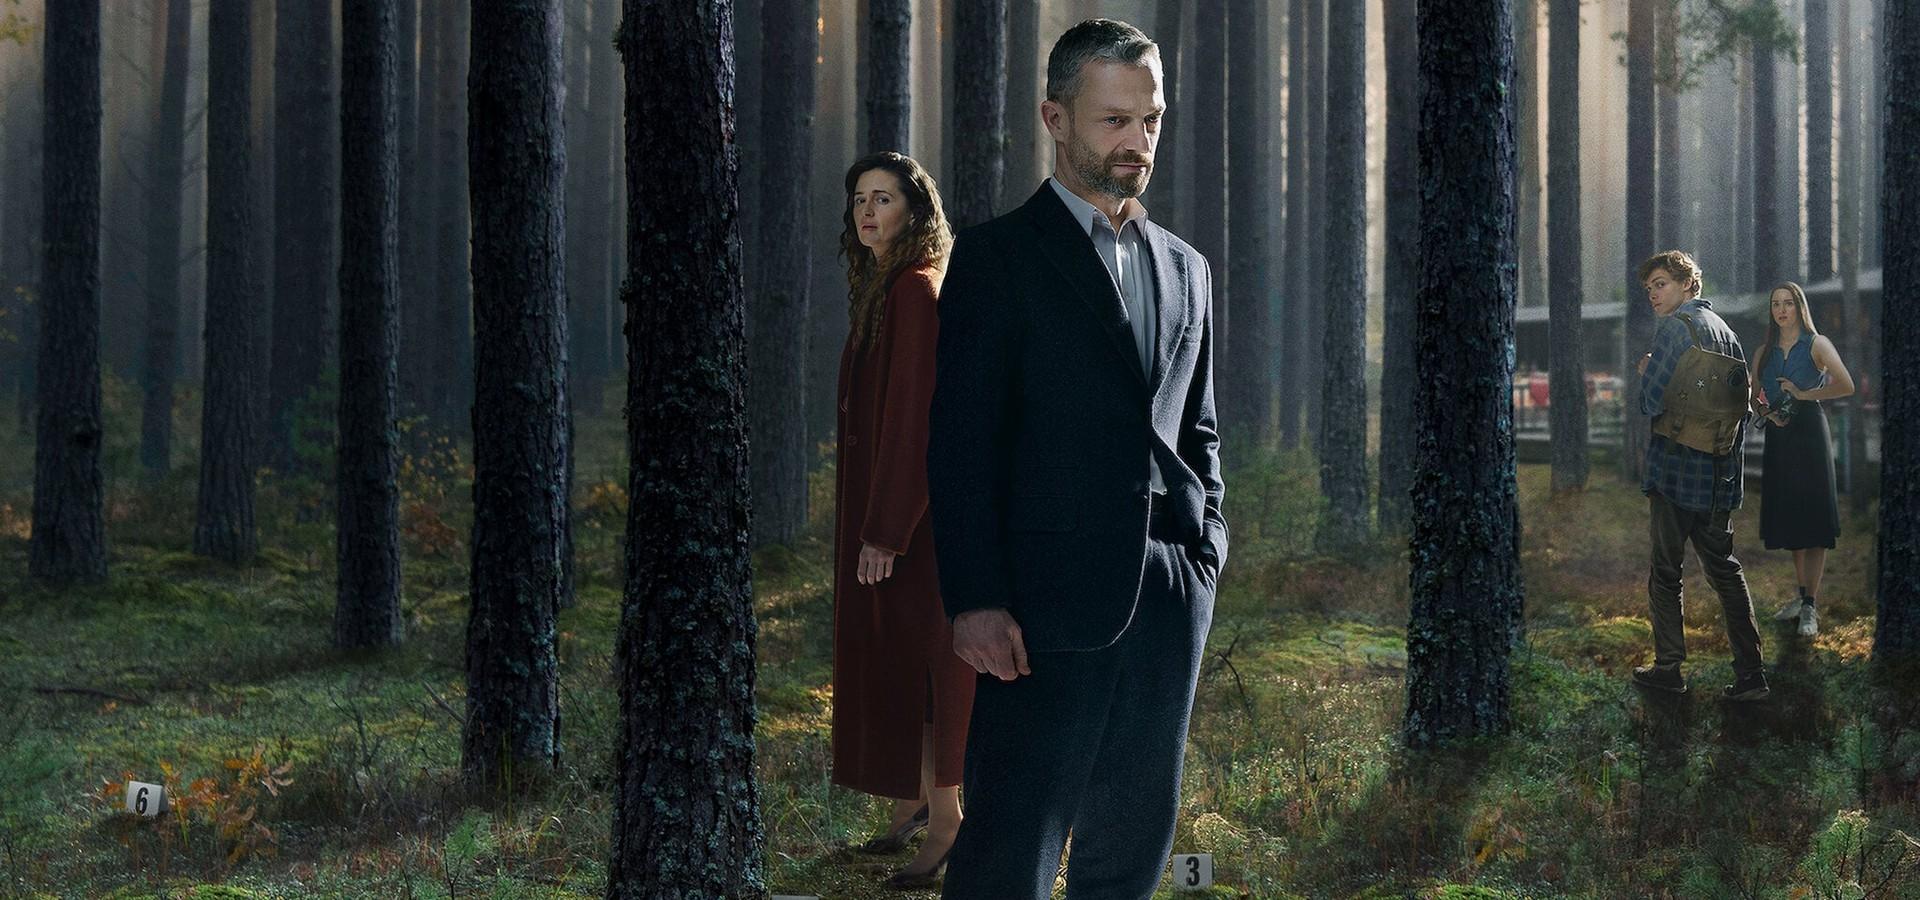 Das Grab im Wald